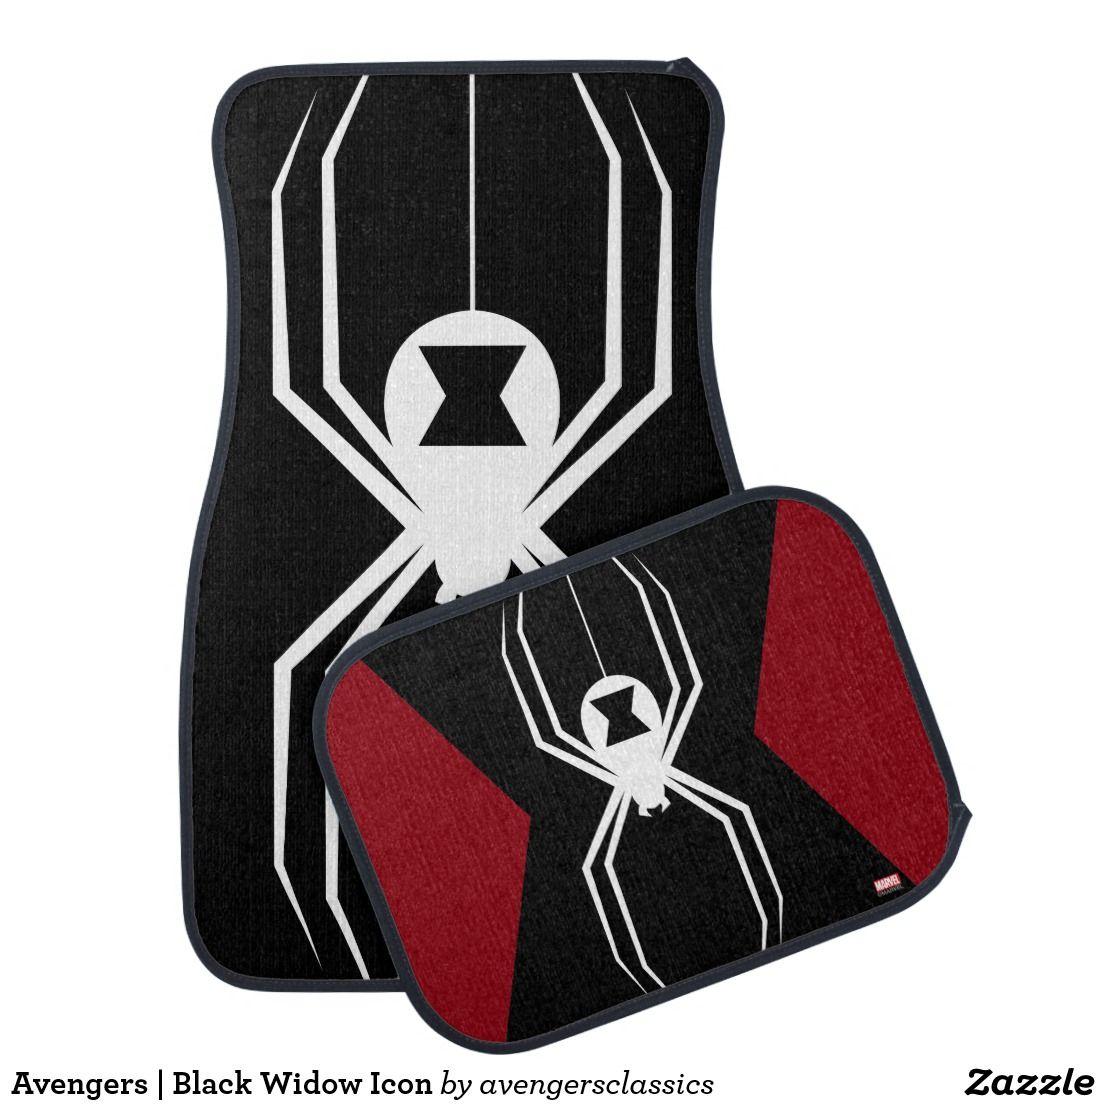 Avengers Black Widow Icon Car Floor Mat Zazzle Com Car Floor Mats Car Icons Floor Mats